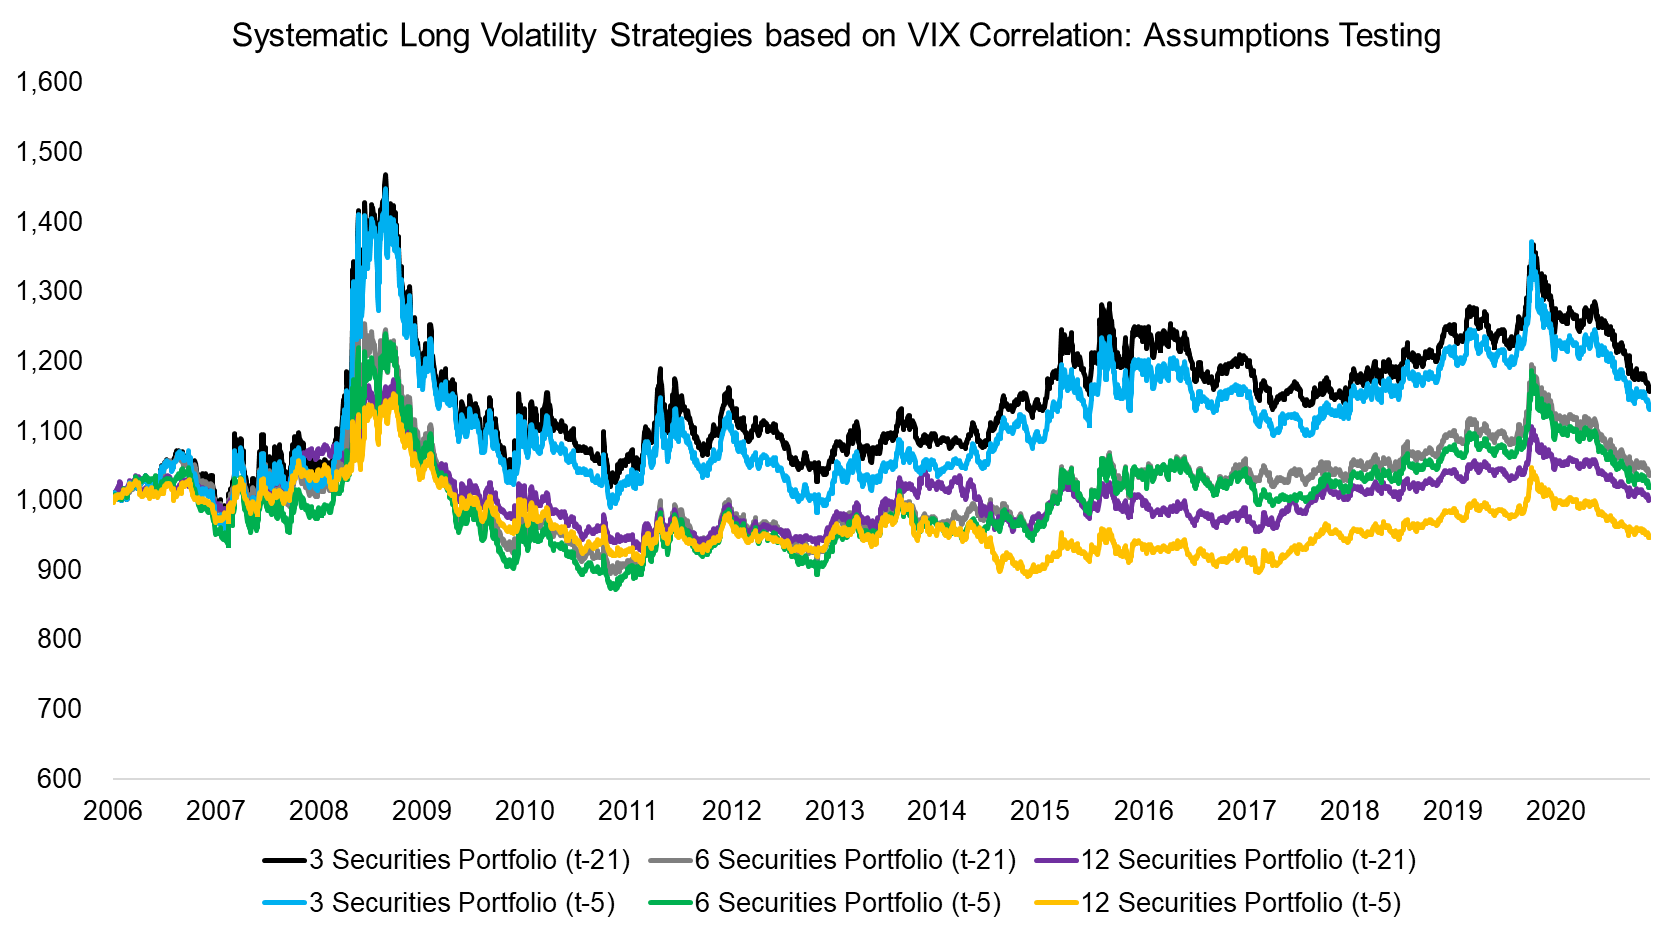 Systematic Long Volatility Strategies based on VIX Correlation Assumptions Testin